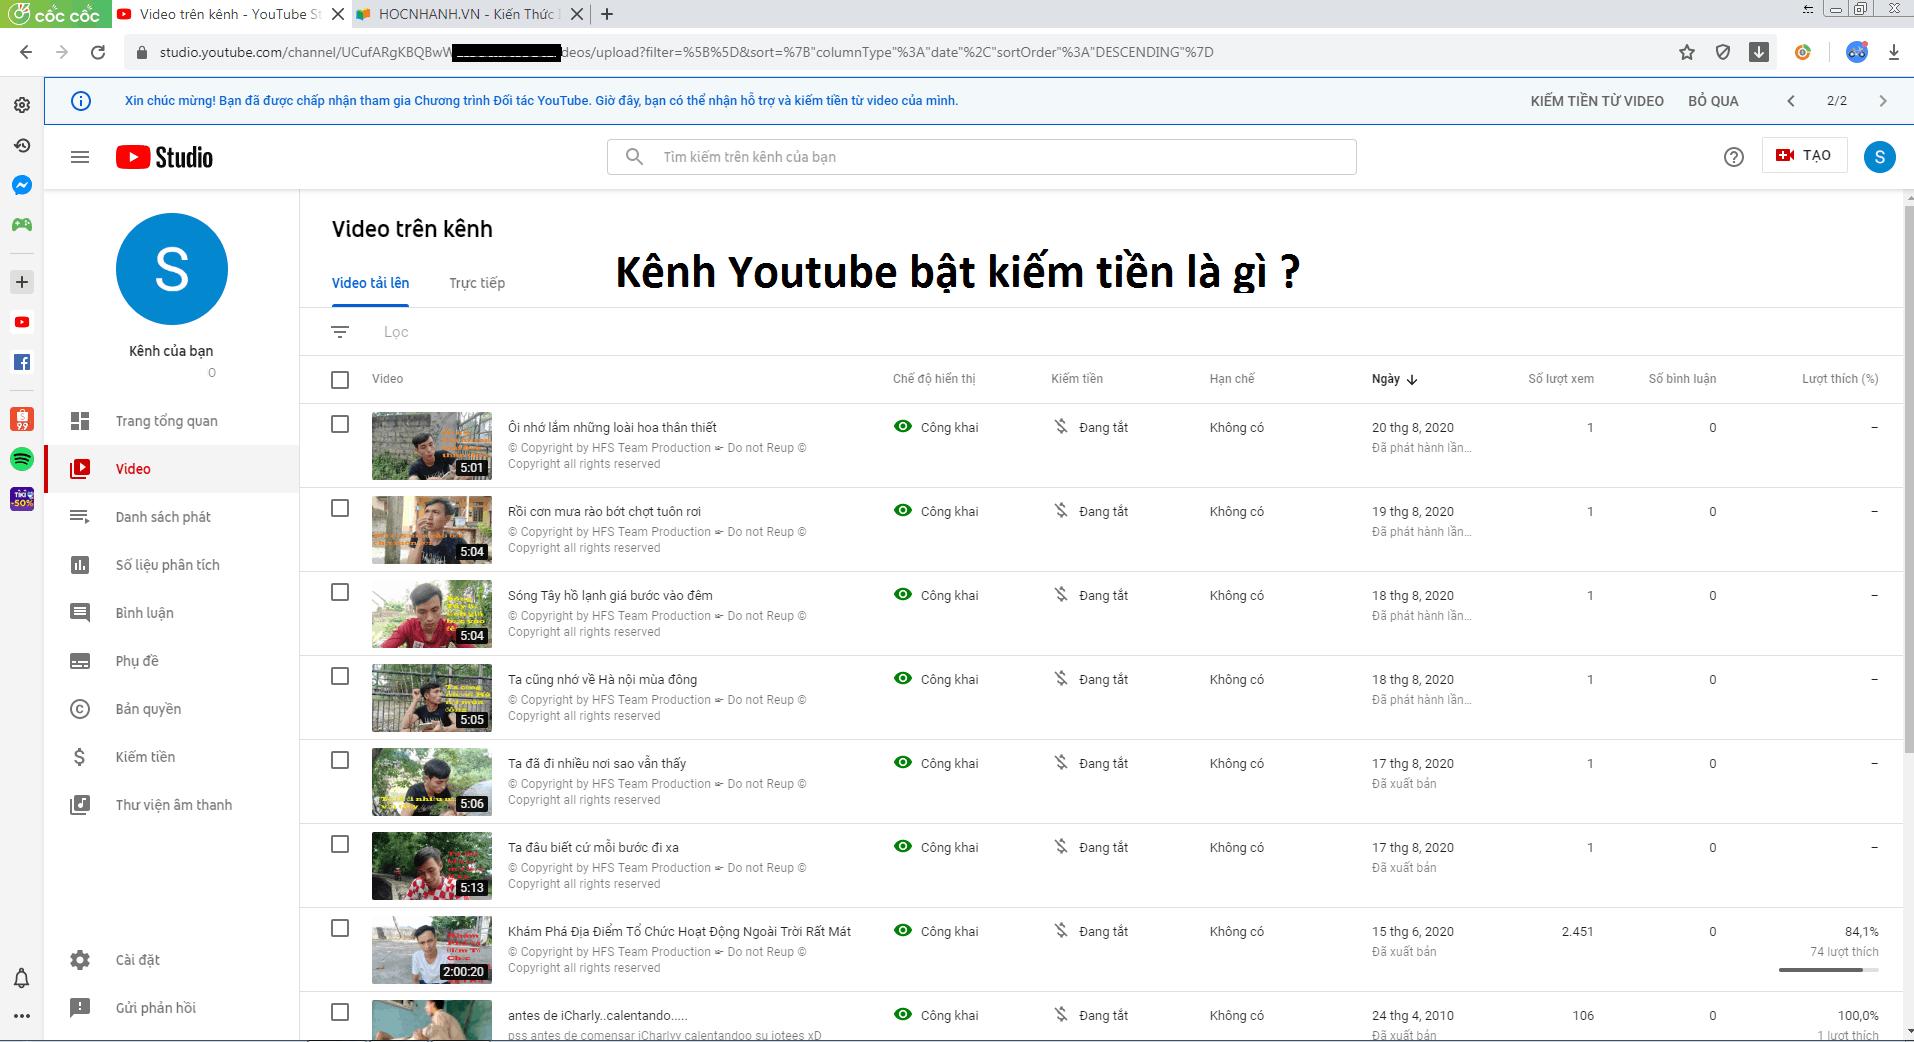 Kenh-Youtube-Bat-Kiem-Tien-La-Gi